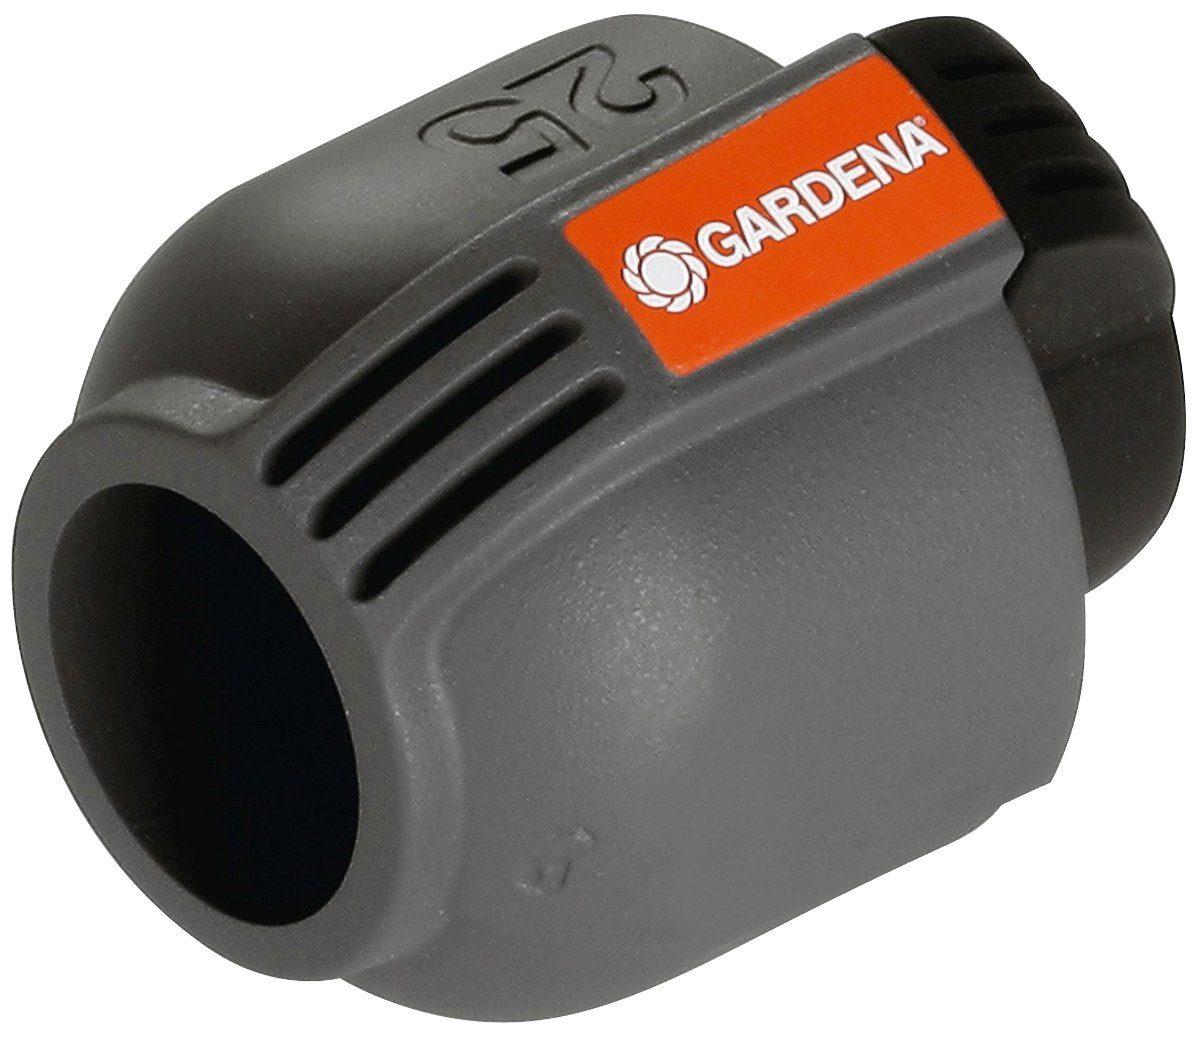 GARDENA Endstück »Sprinklersystem«, 25 mm